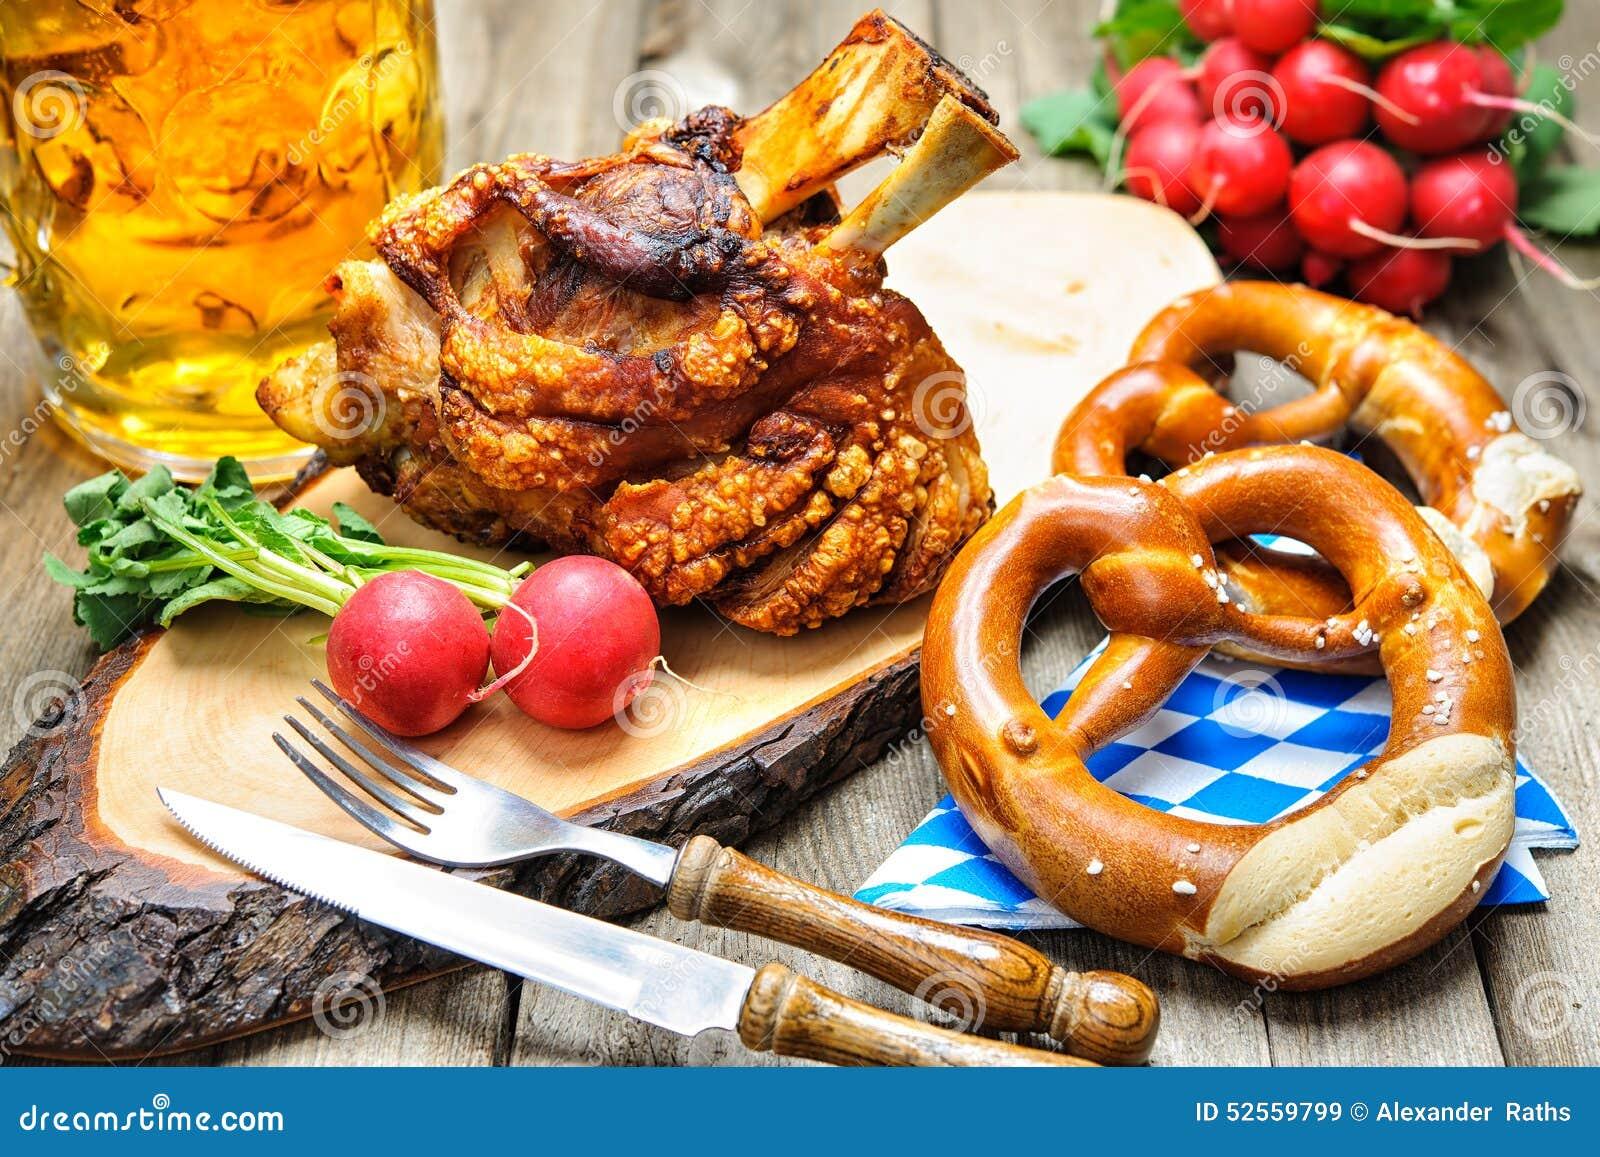 Oktoberfest Stock Photo - Image: 52559799